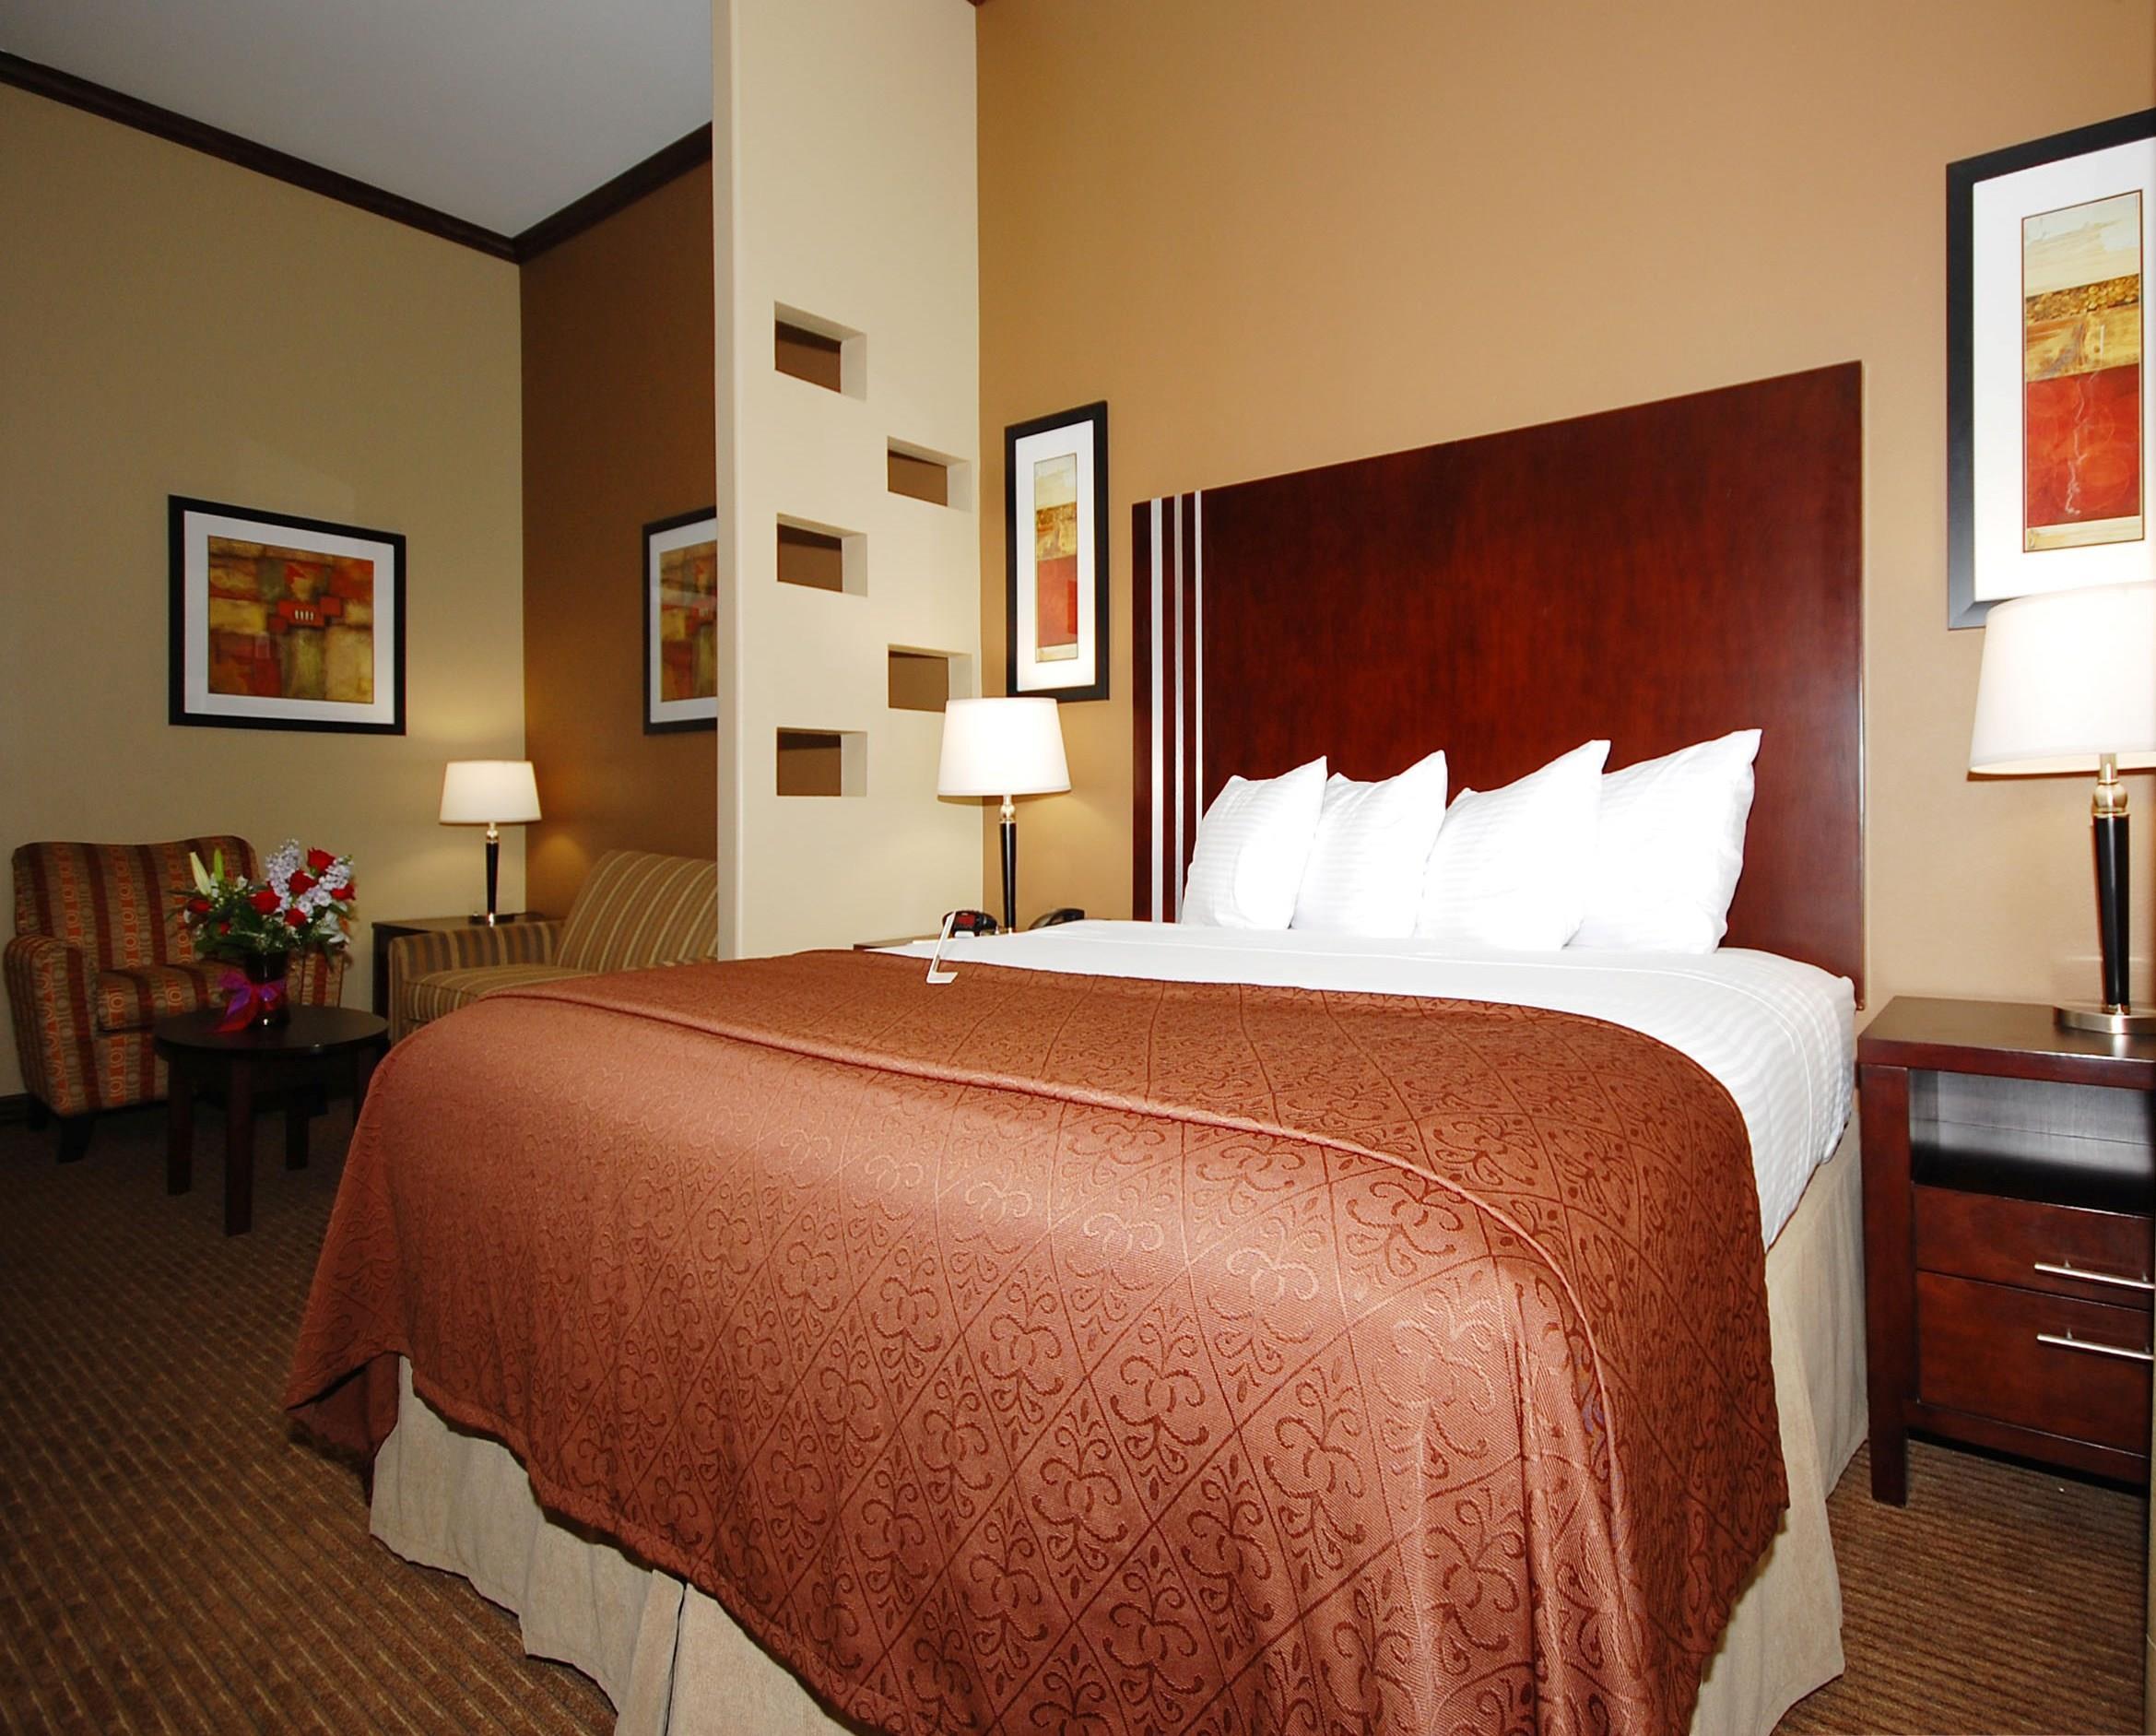 Best Western Plus Texoma Hotel & Suites image 25